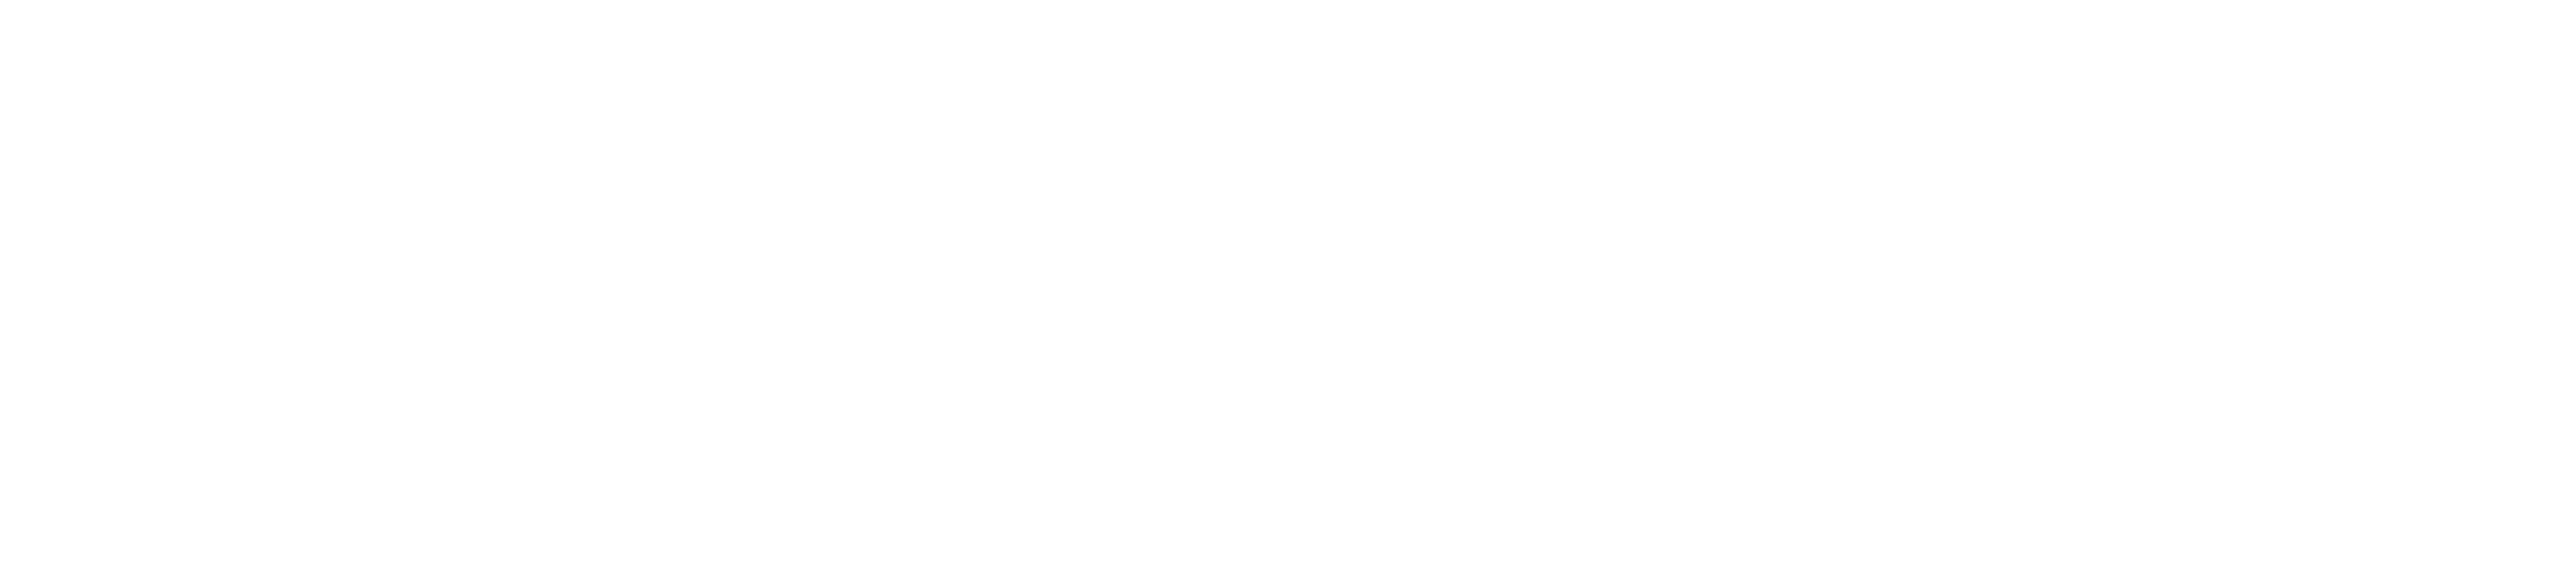 SmartSense-Logo-ALL WHT.png